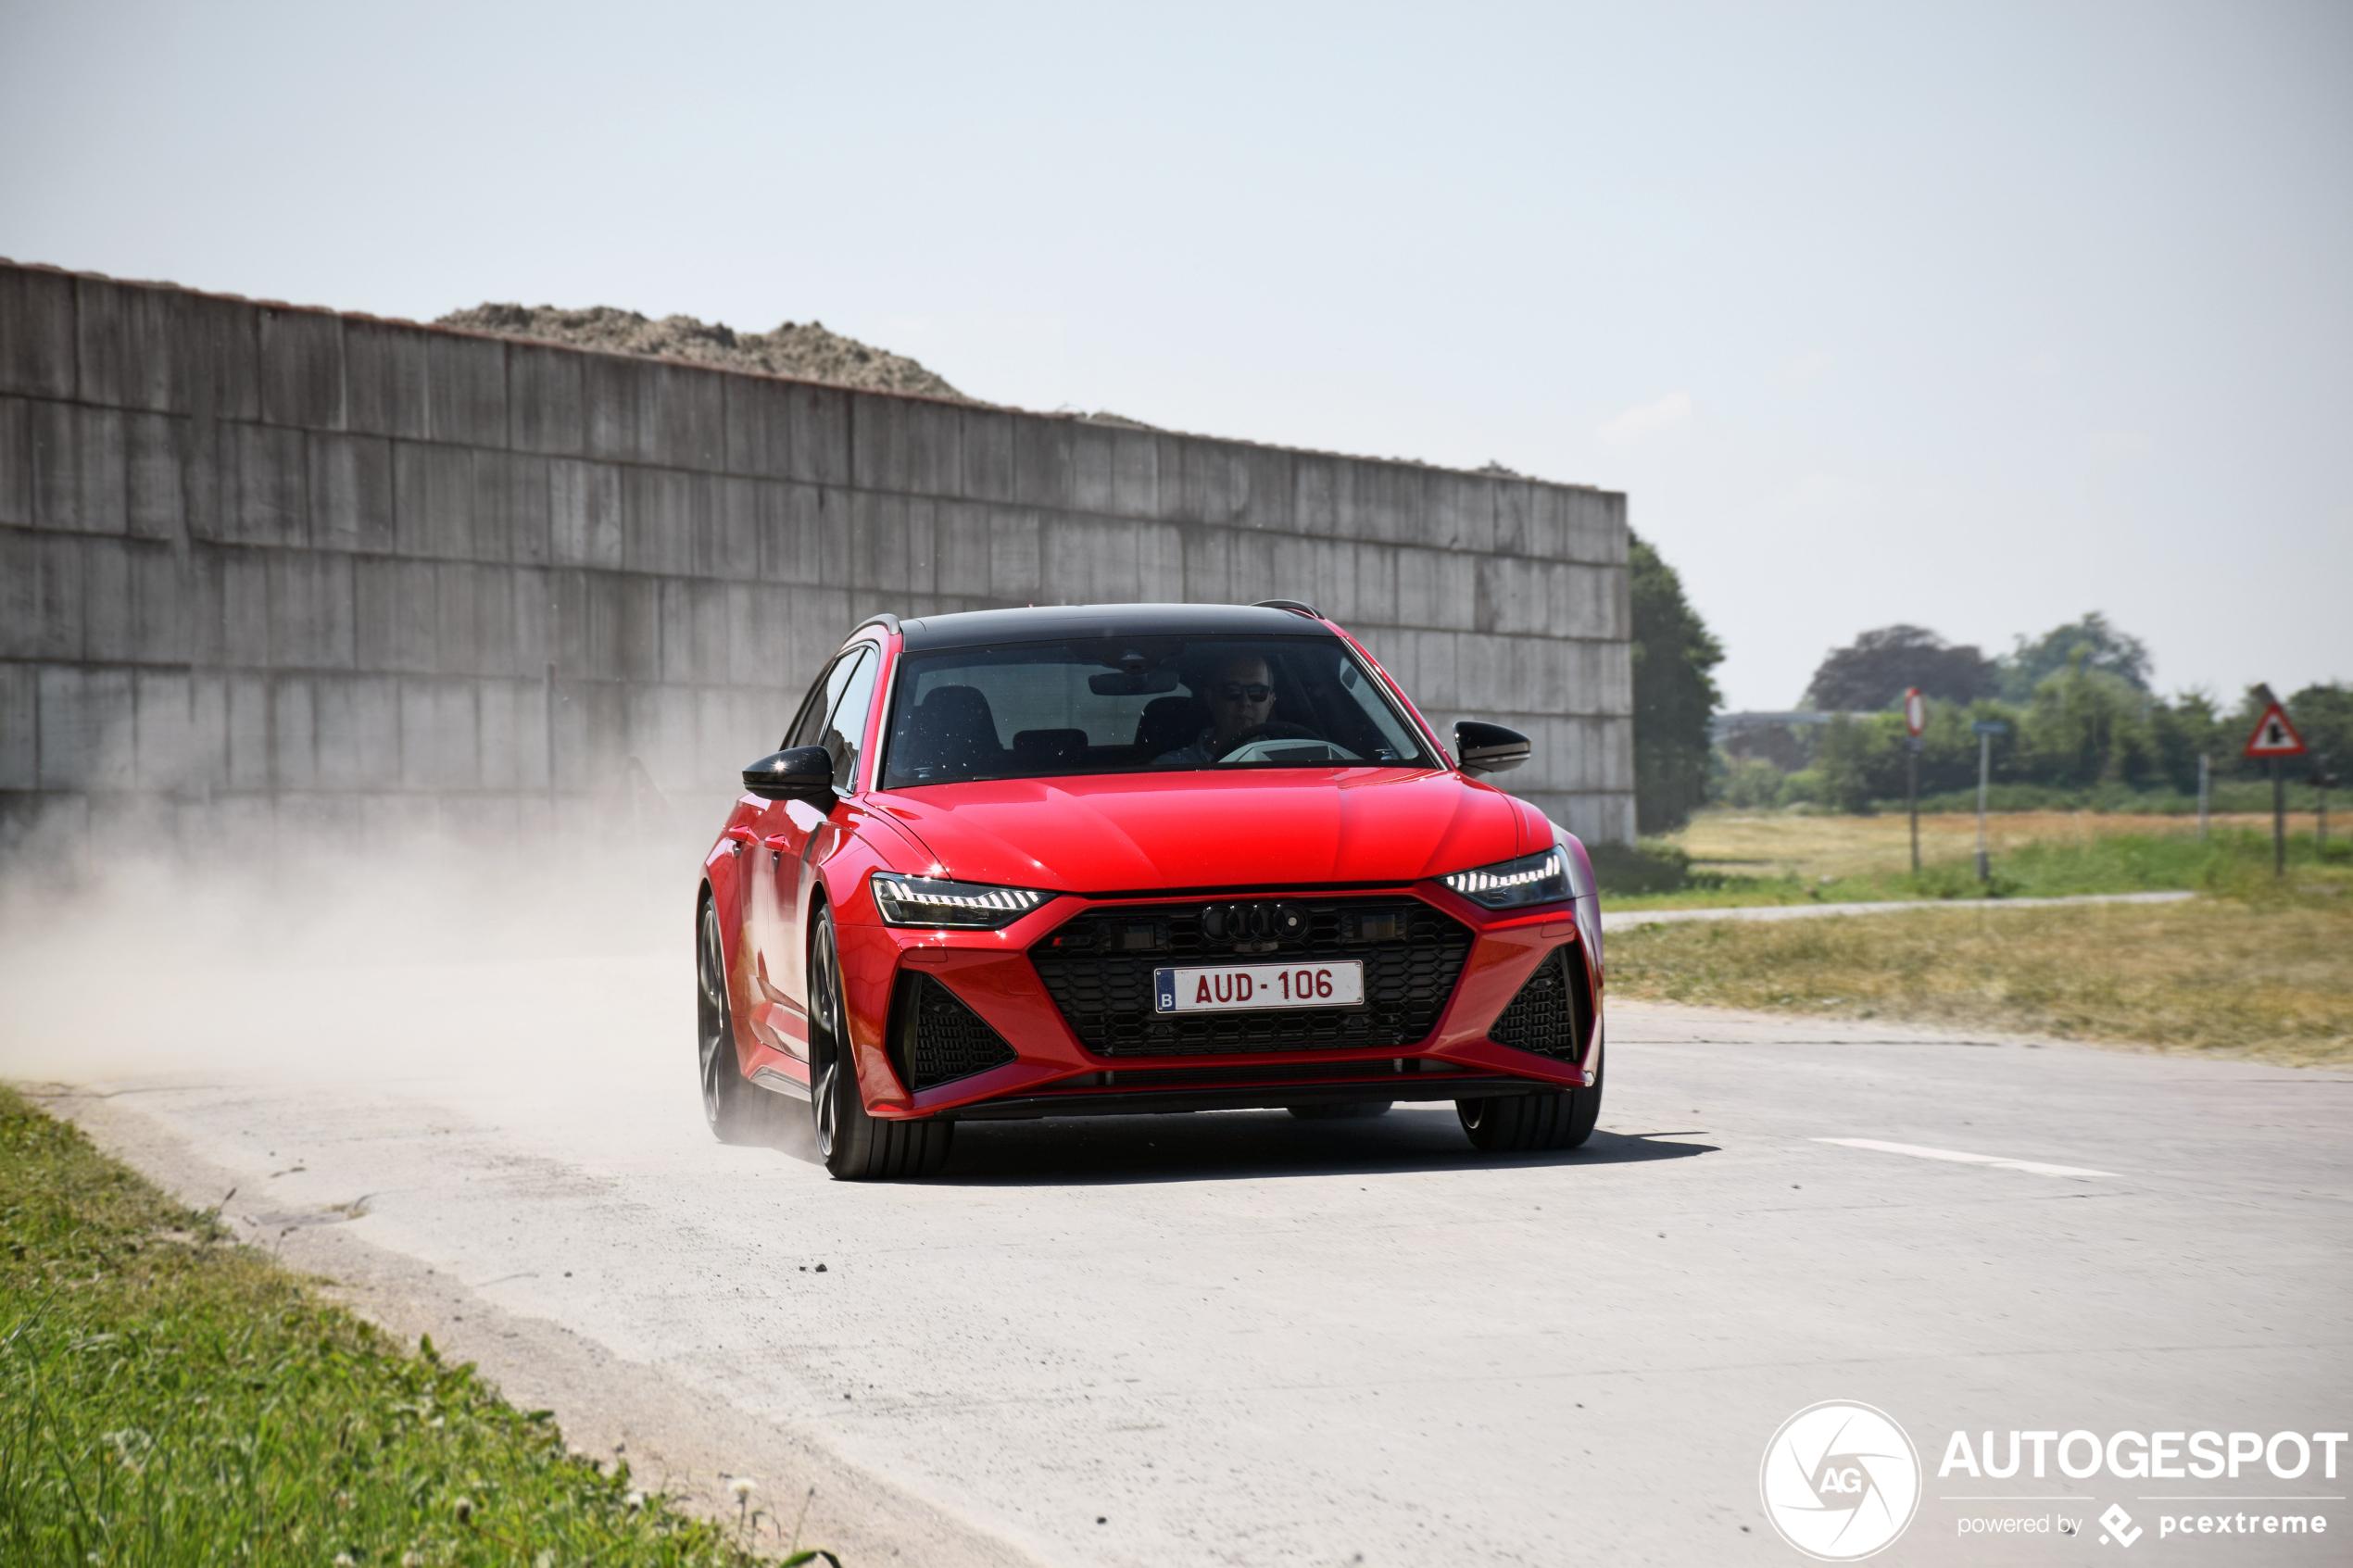 Audi RS6 Avant boezemt angst in met deze foto's